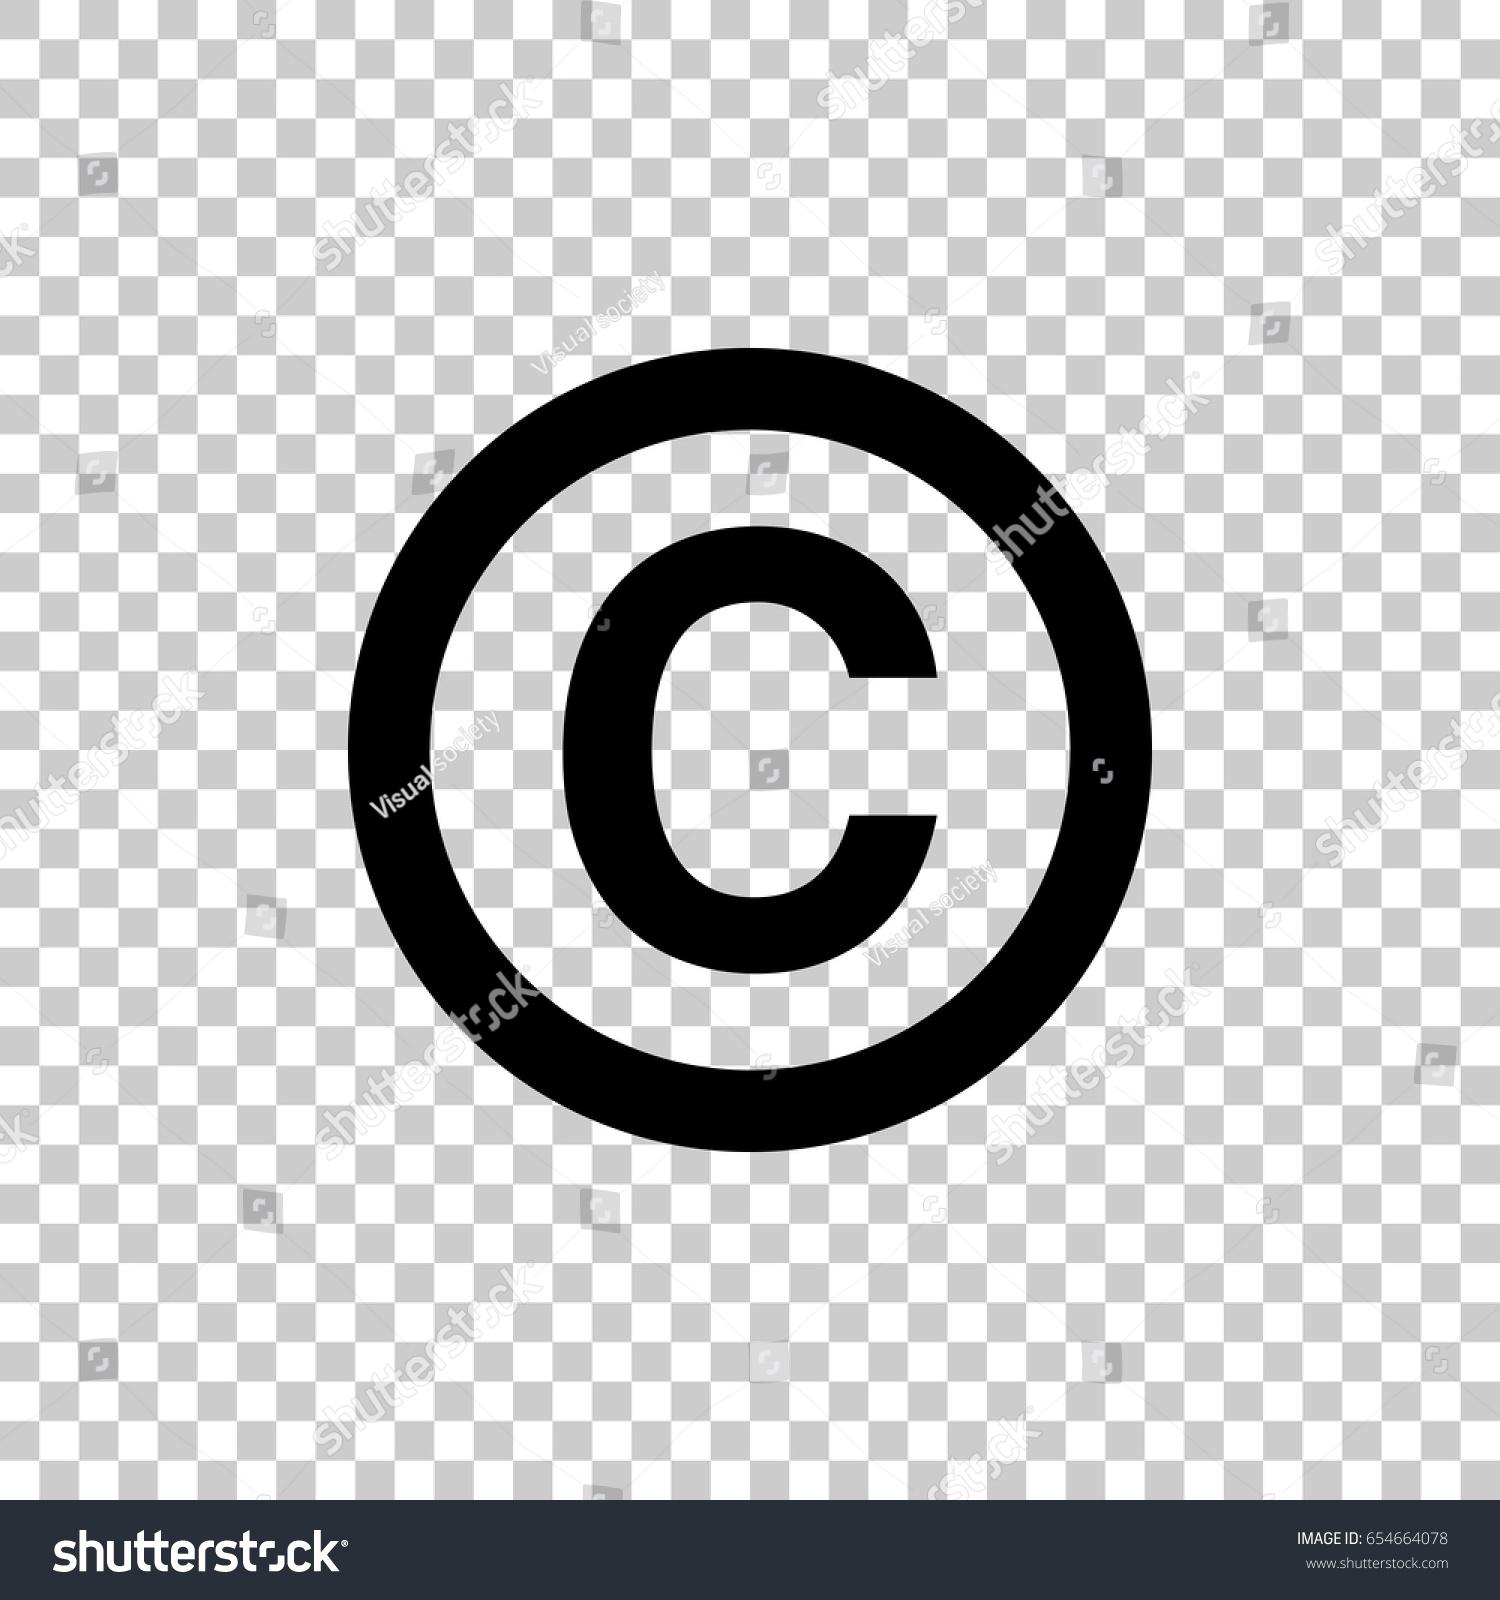 Copyright symbol isolated on transparent background stock vector copyright symbol isolated on transparent background black symbol for your design vector illustration biocorpaavc